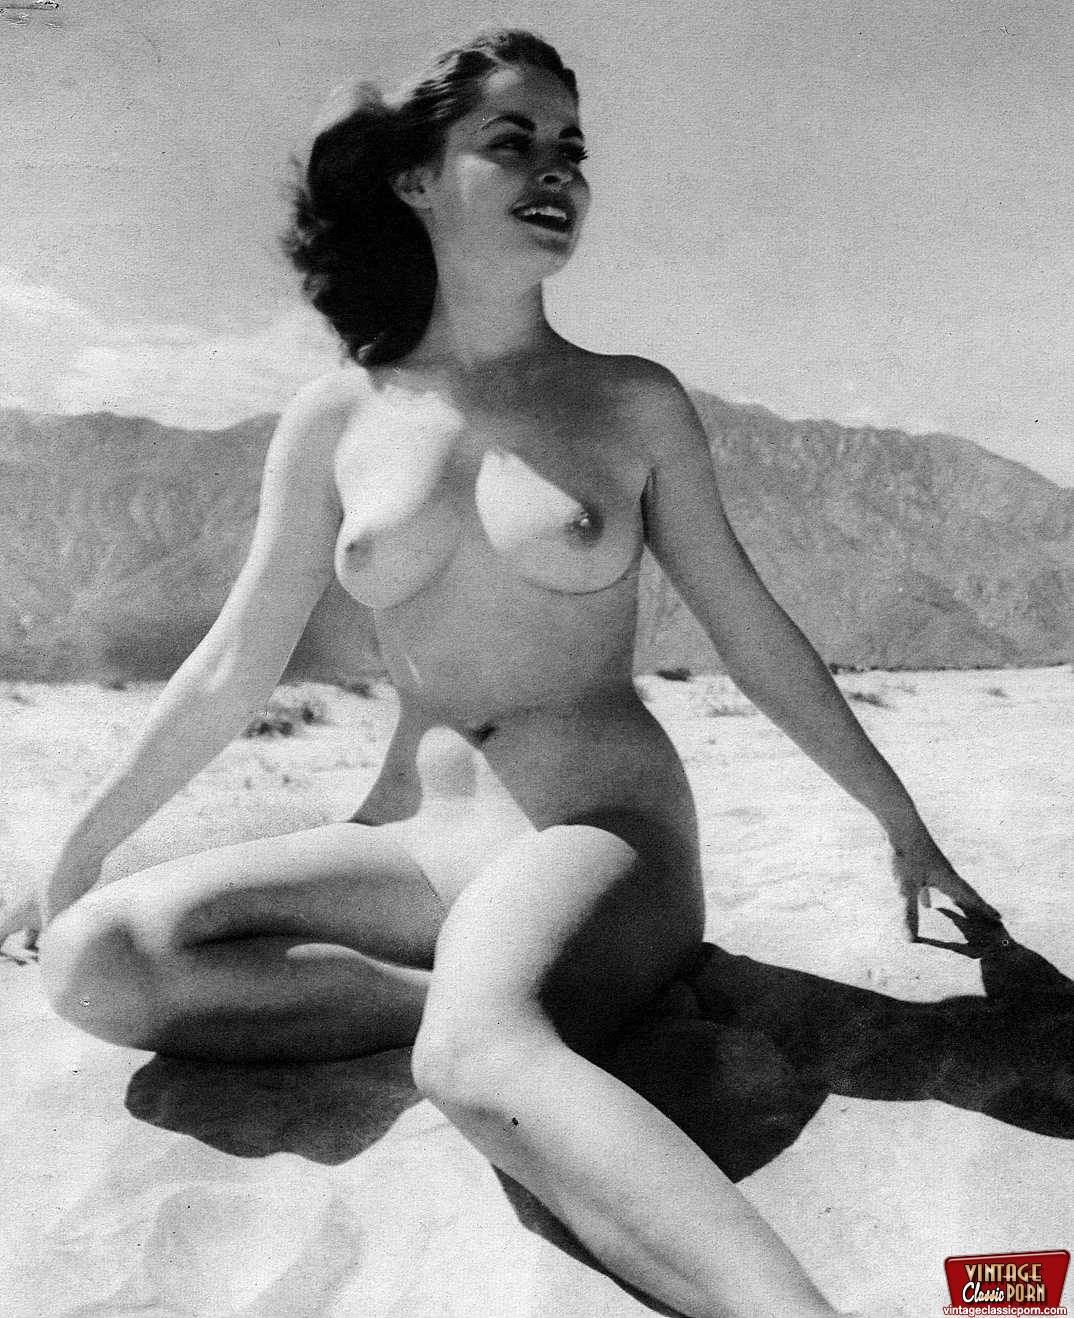 1940s interracial porn